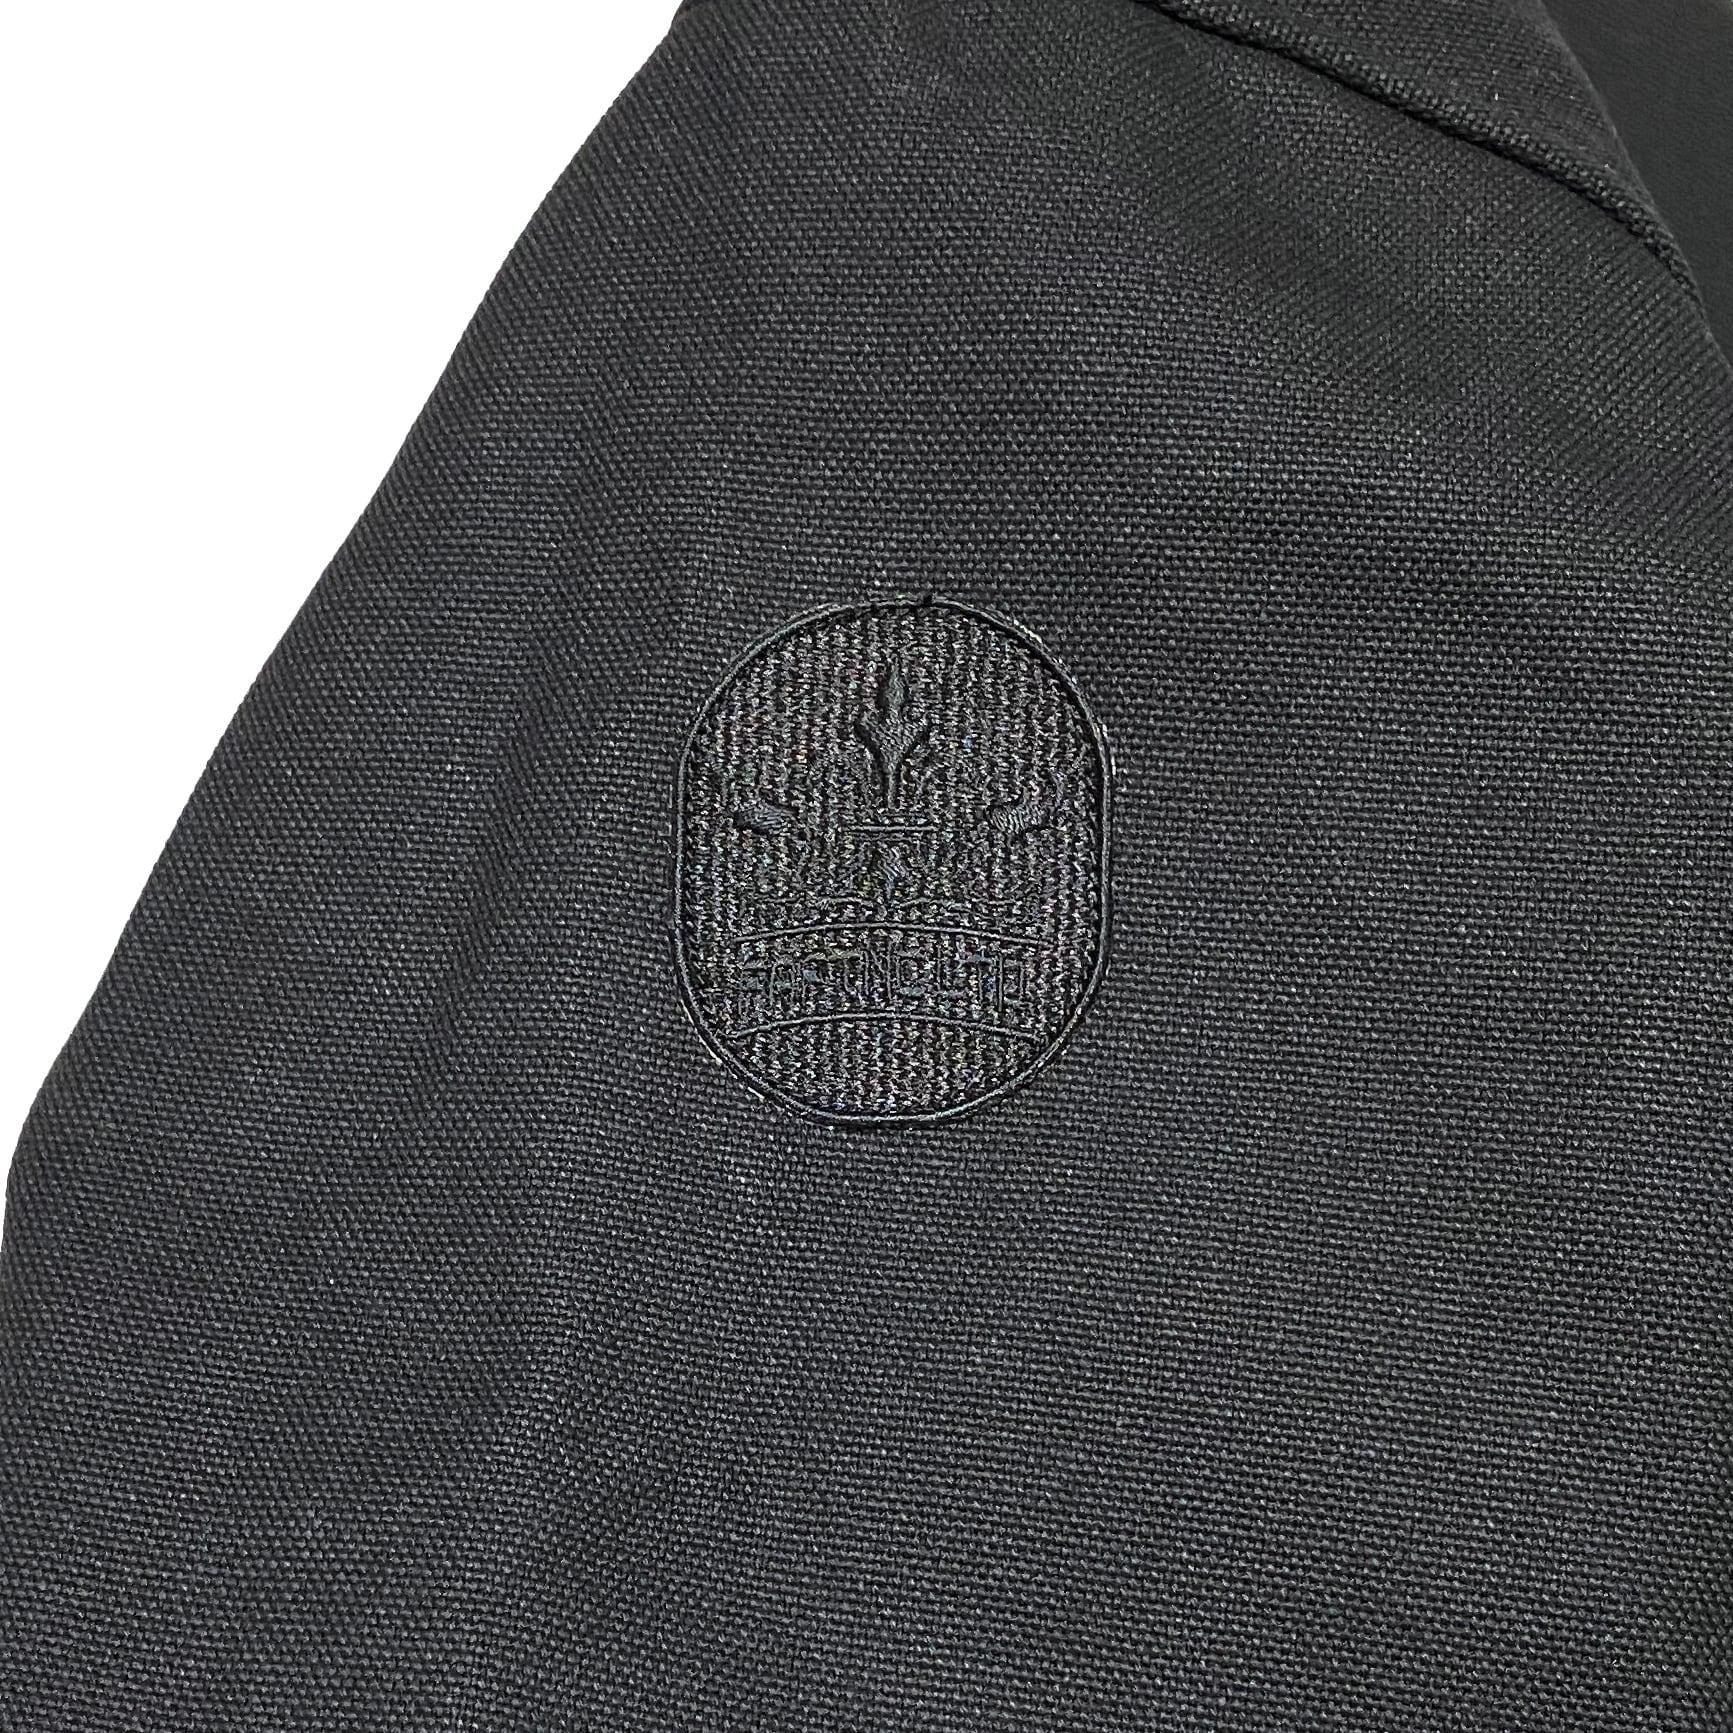 Petroit Work Jacket / Black - 画像4